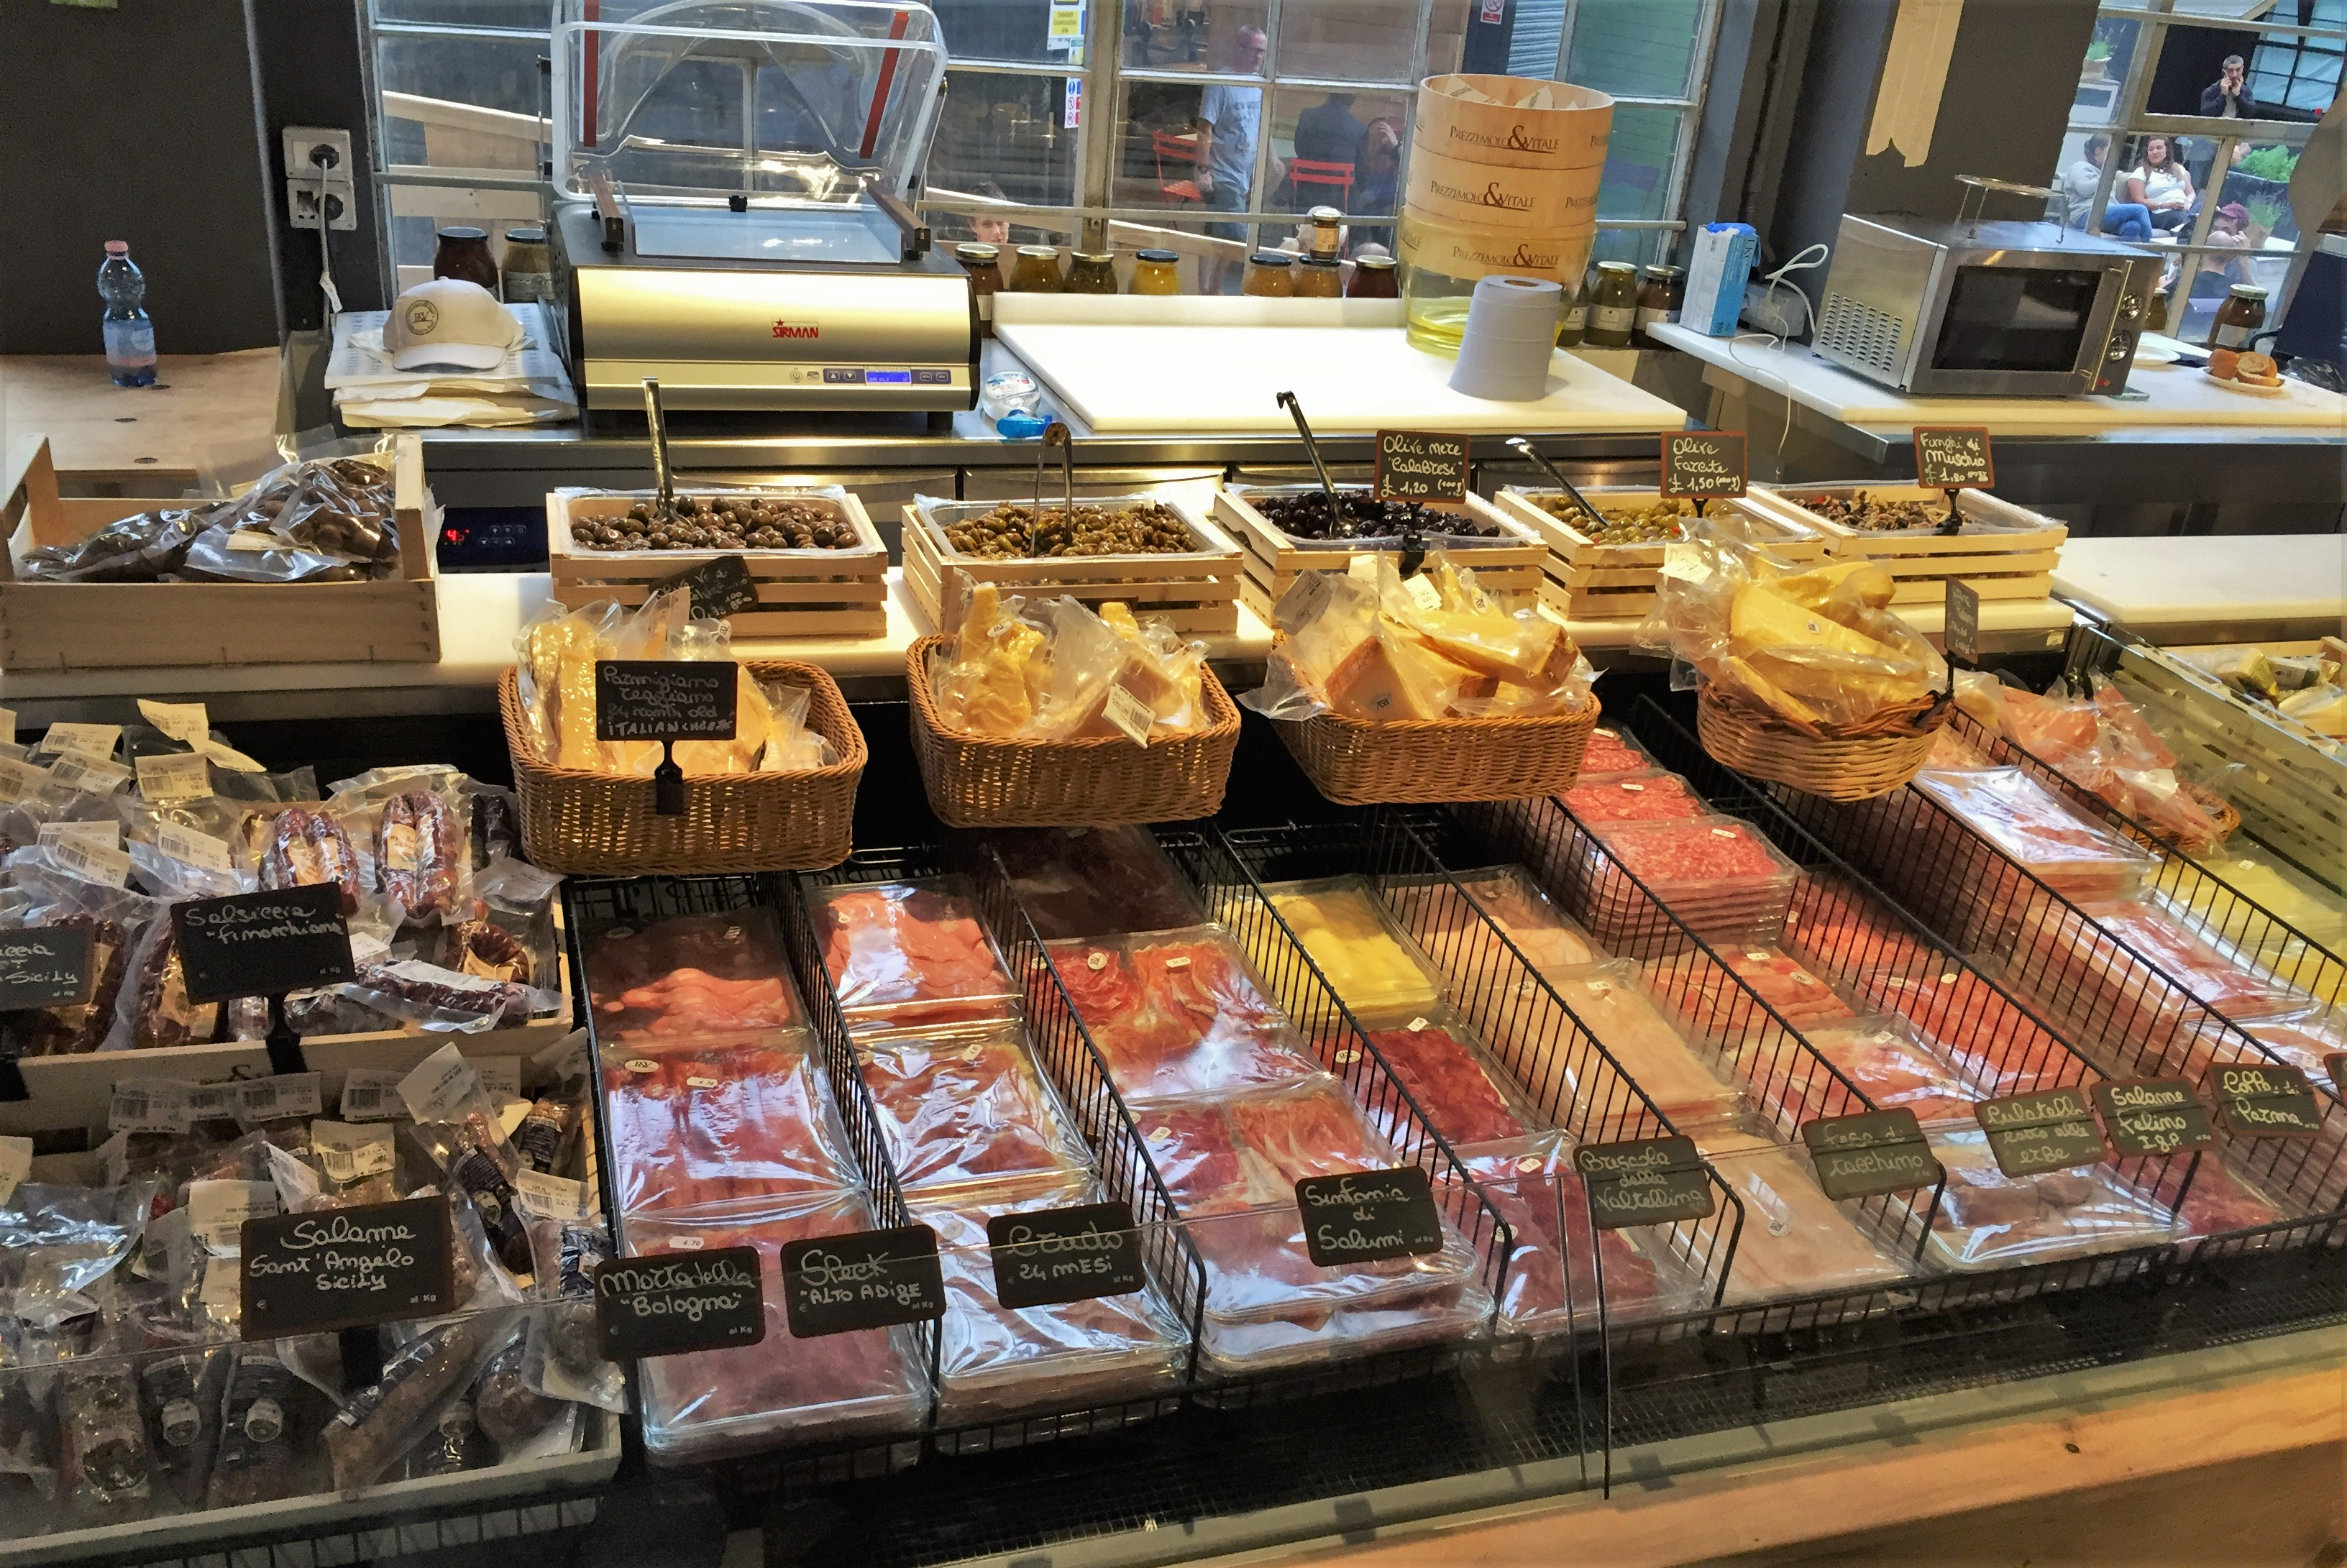 Mercato Metropolitano meats - kenningtonrunoff.com